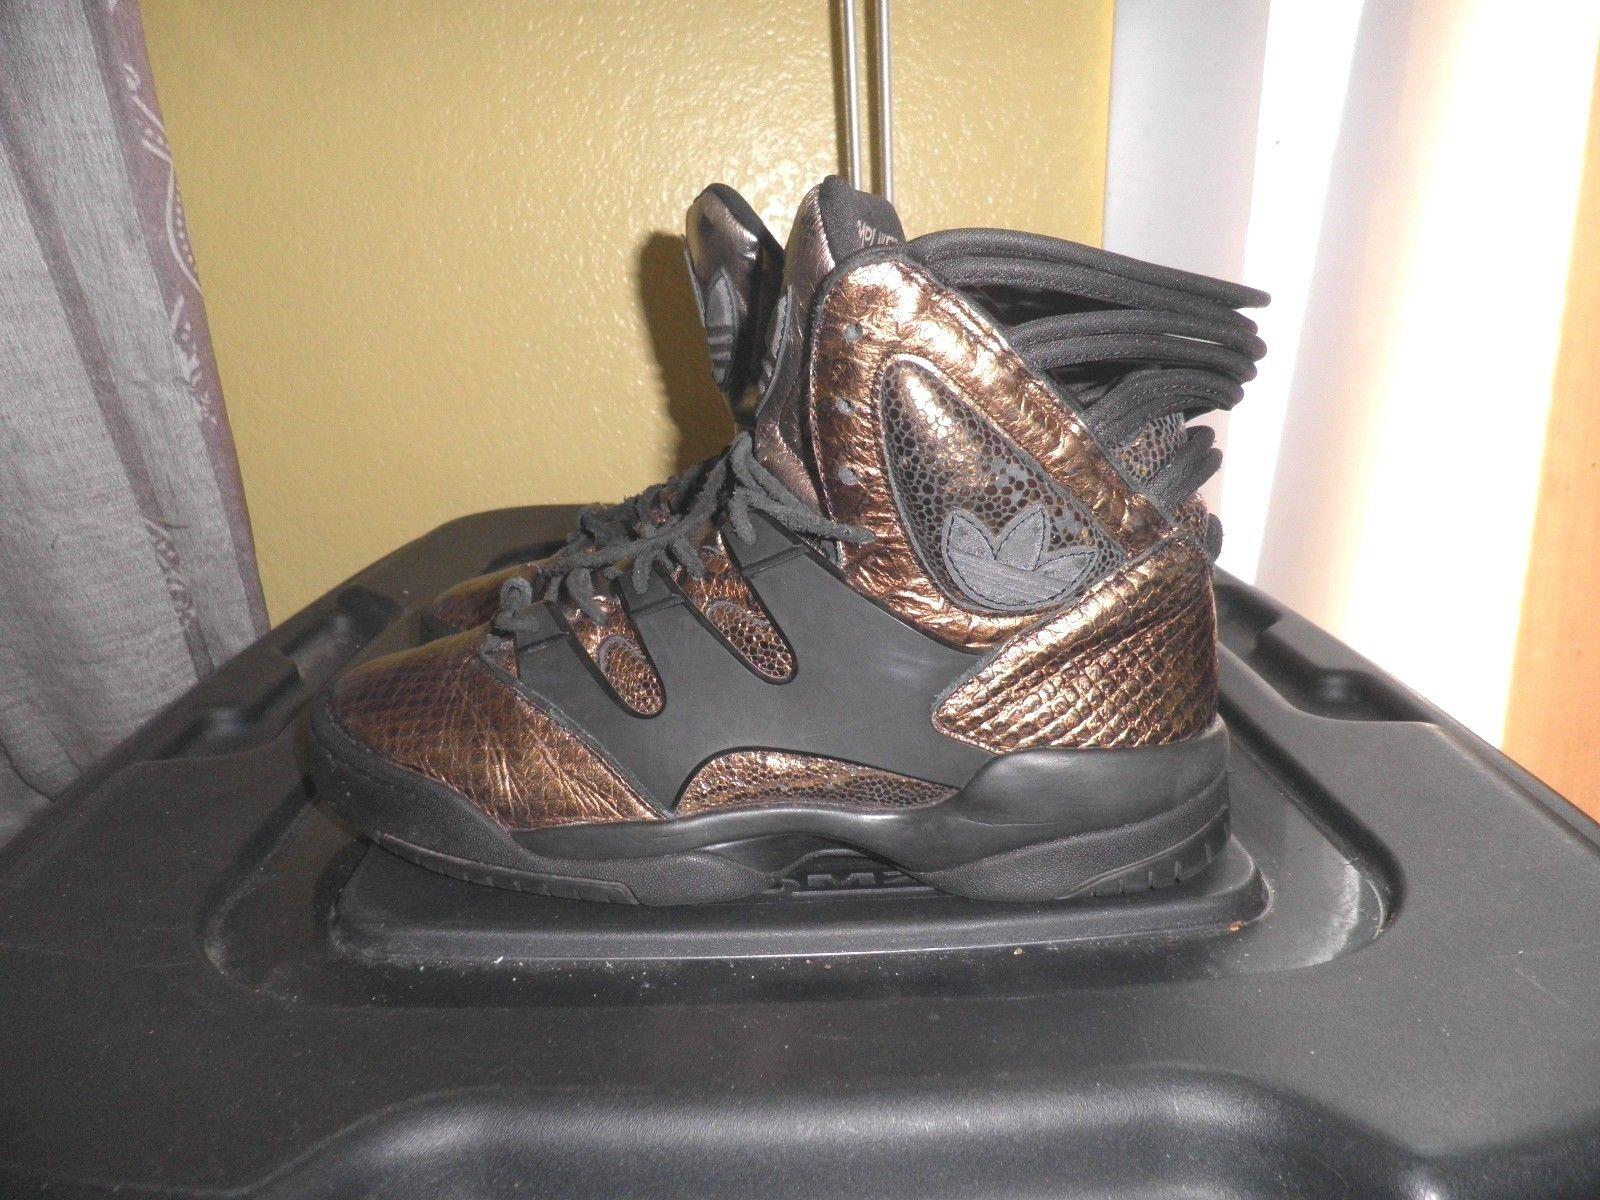 Adidas Teyana taylor Harlem GLC Size 7